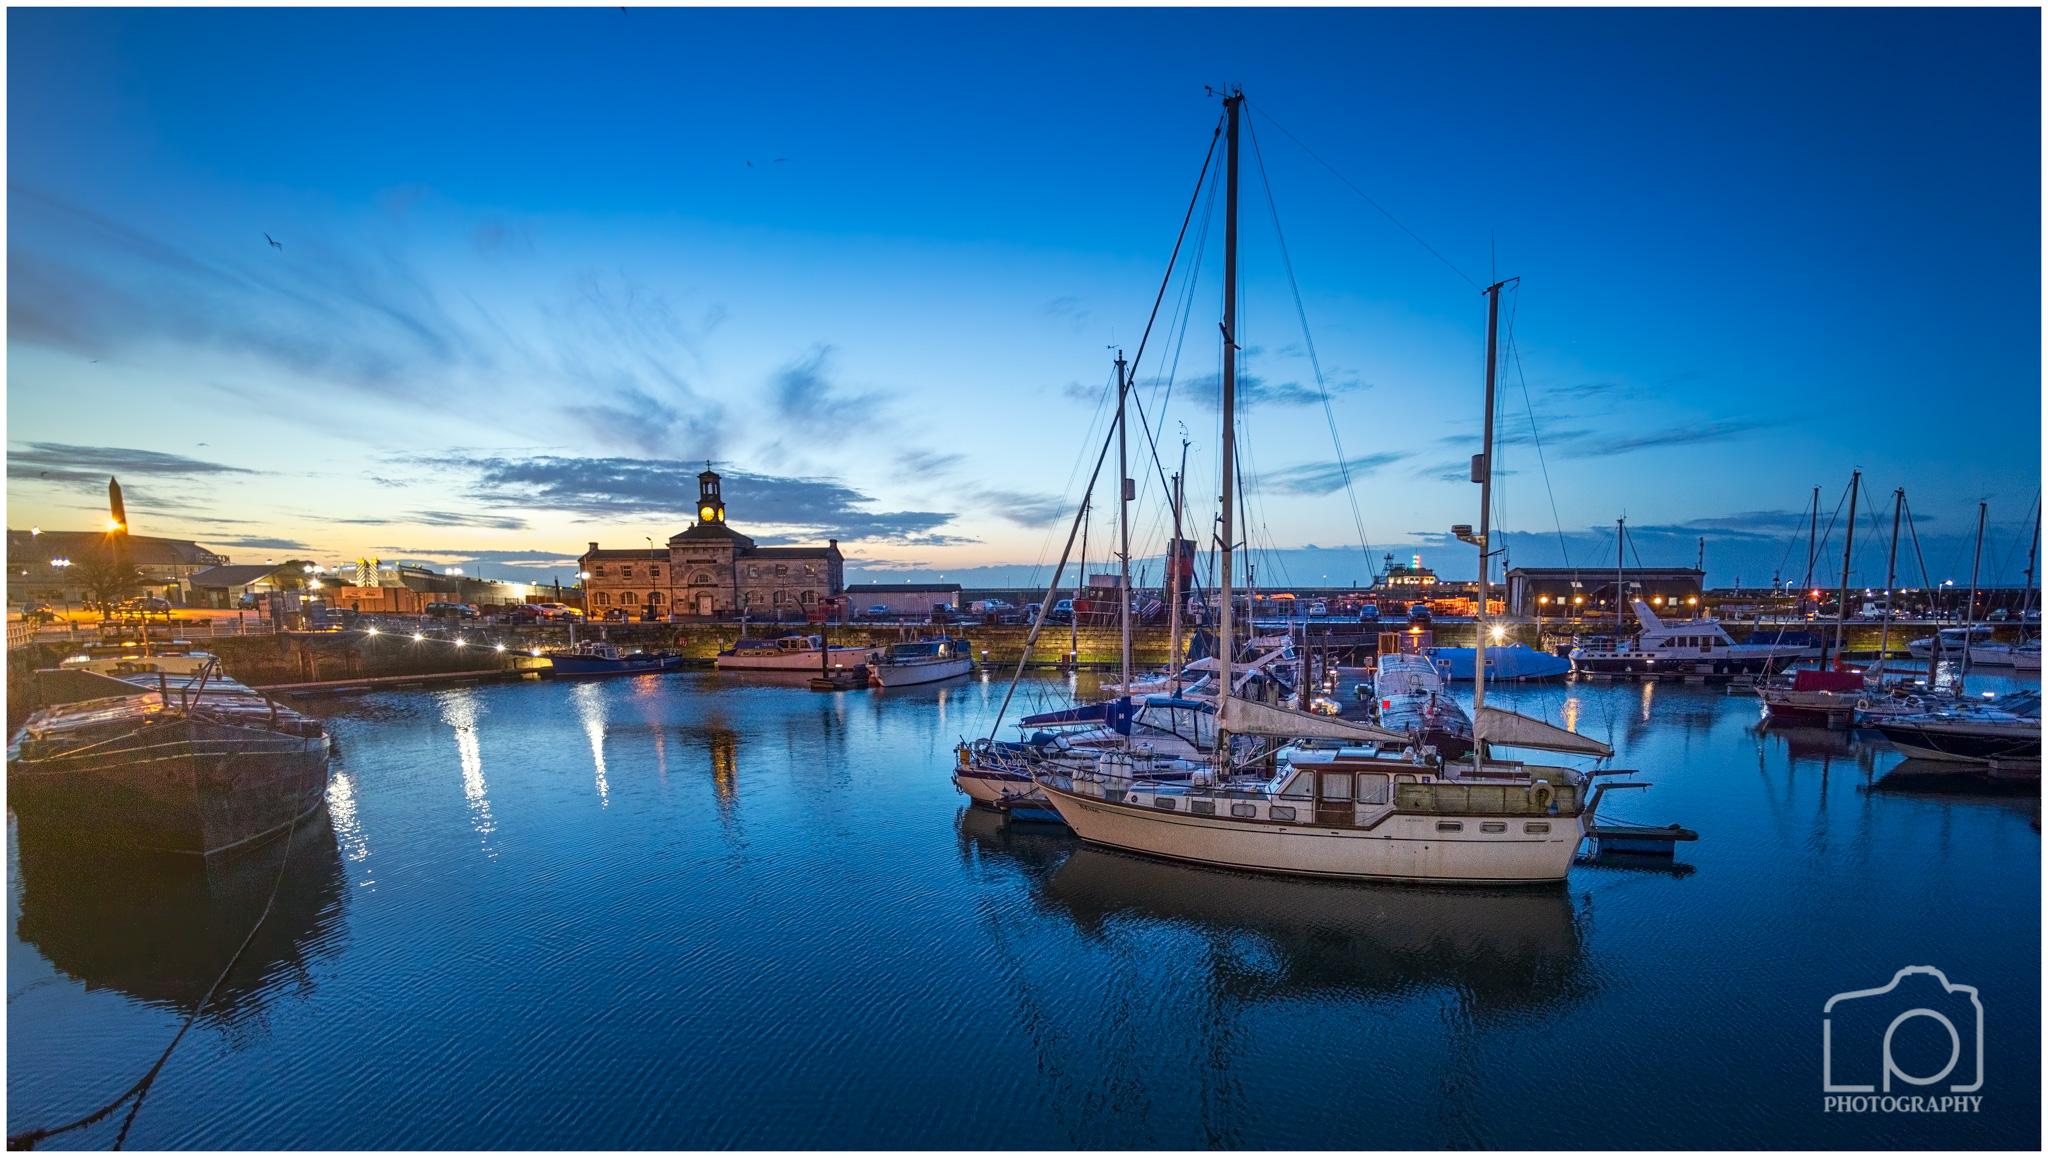 Ramsgate Harbour, United Kingdom